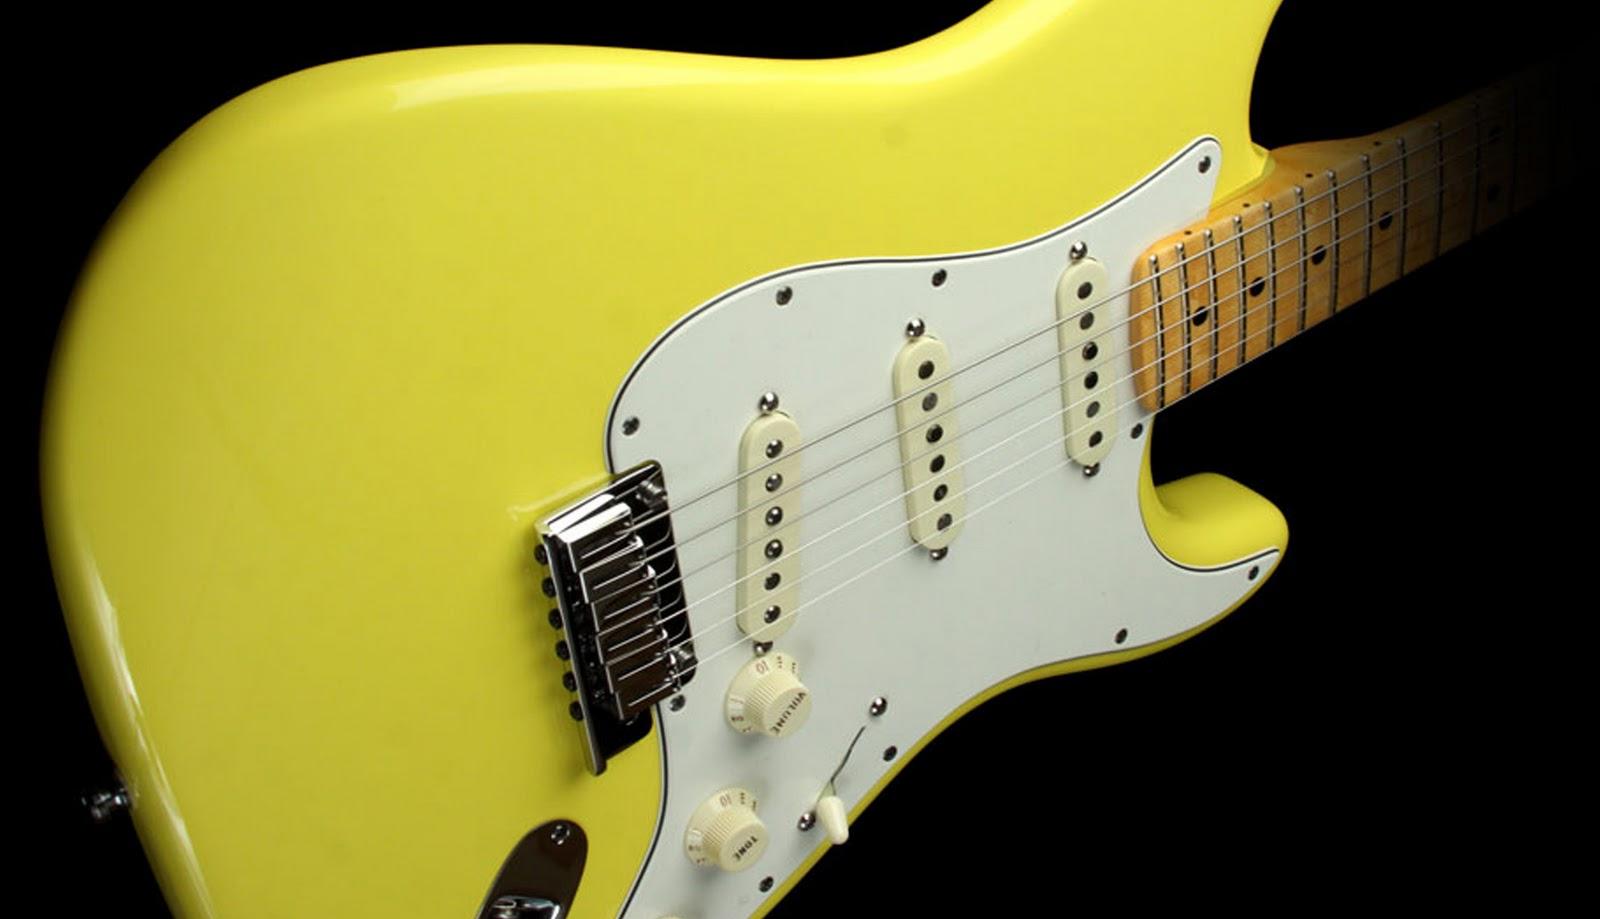 Guitar Wallpaper   Yellow Fender Stratocaster Electric Guitar   Body 1600x919